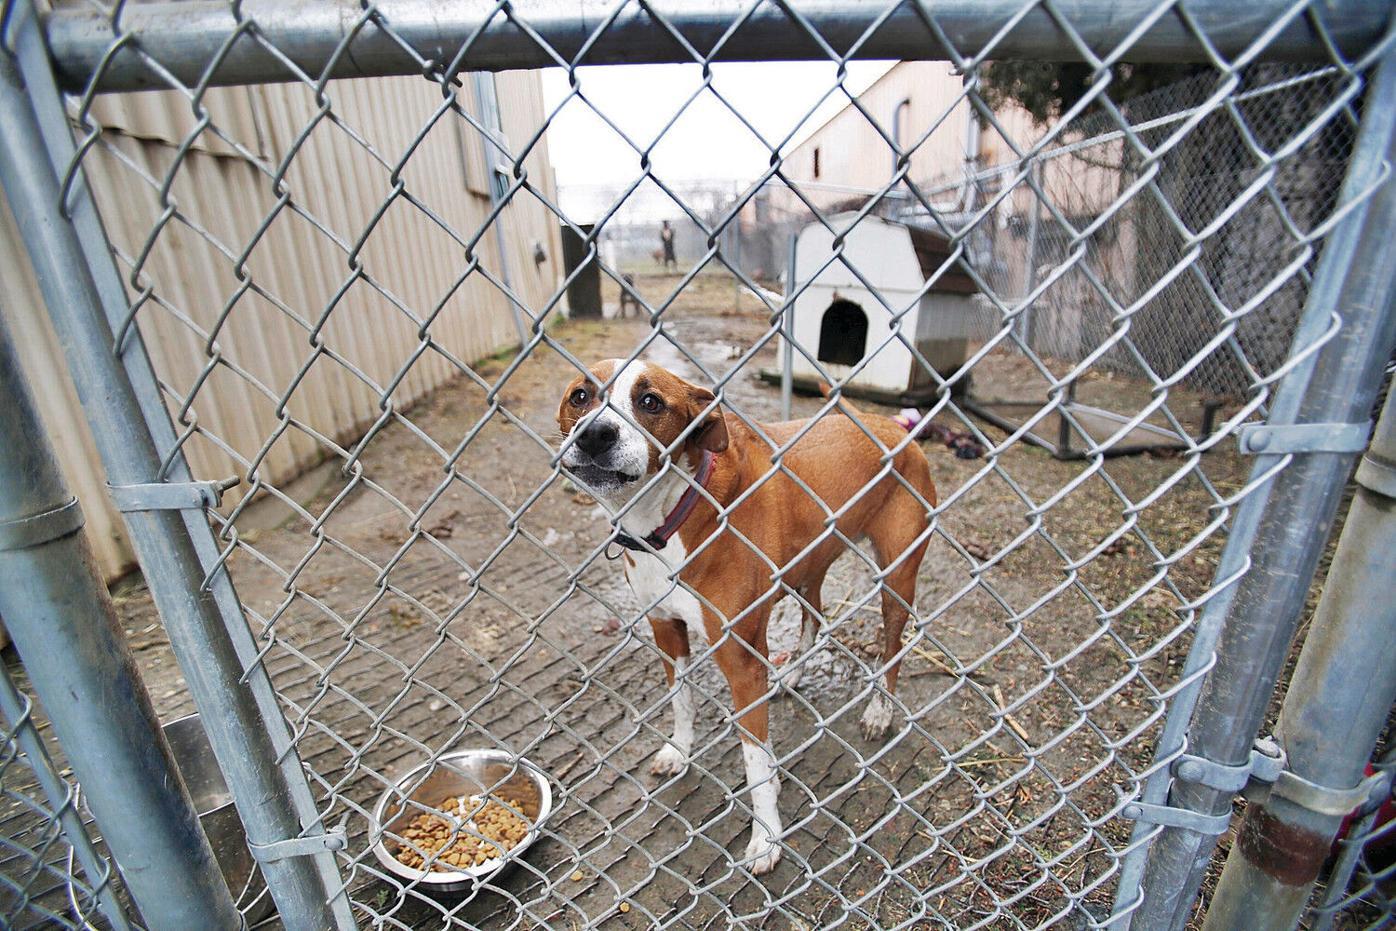 Eleanor Sonsini Animal Shelter staff refuses to leave